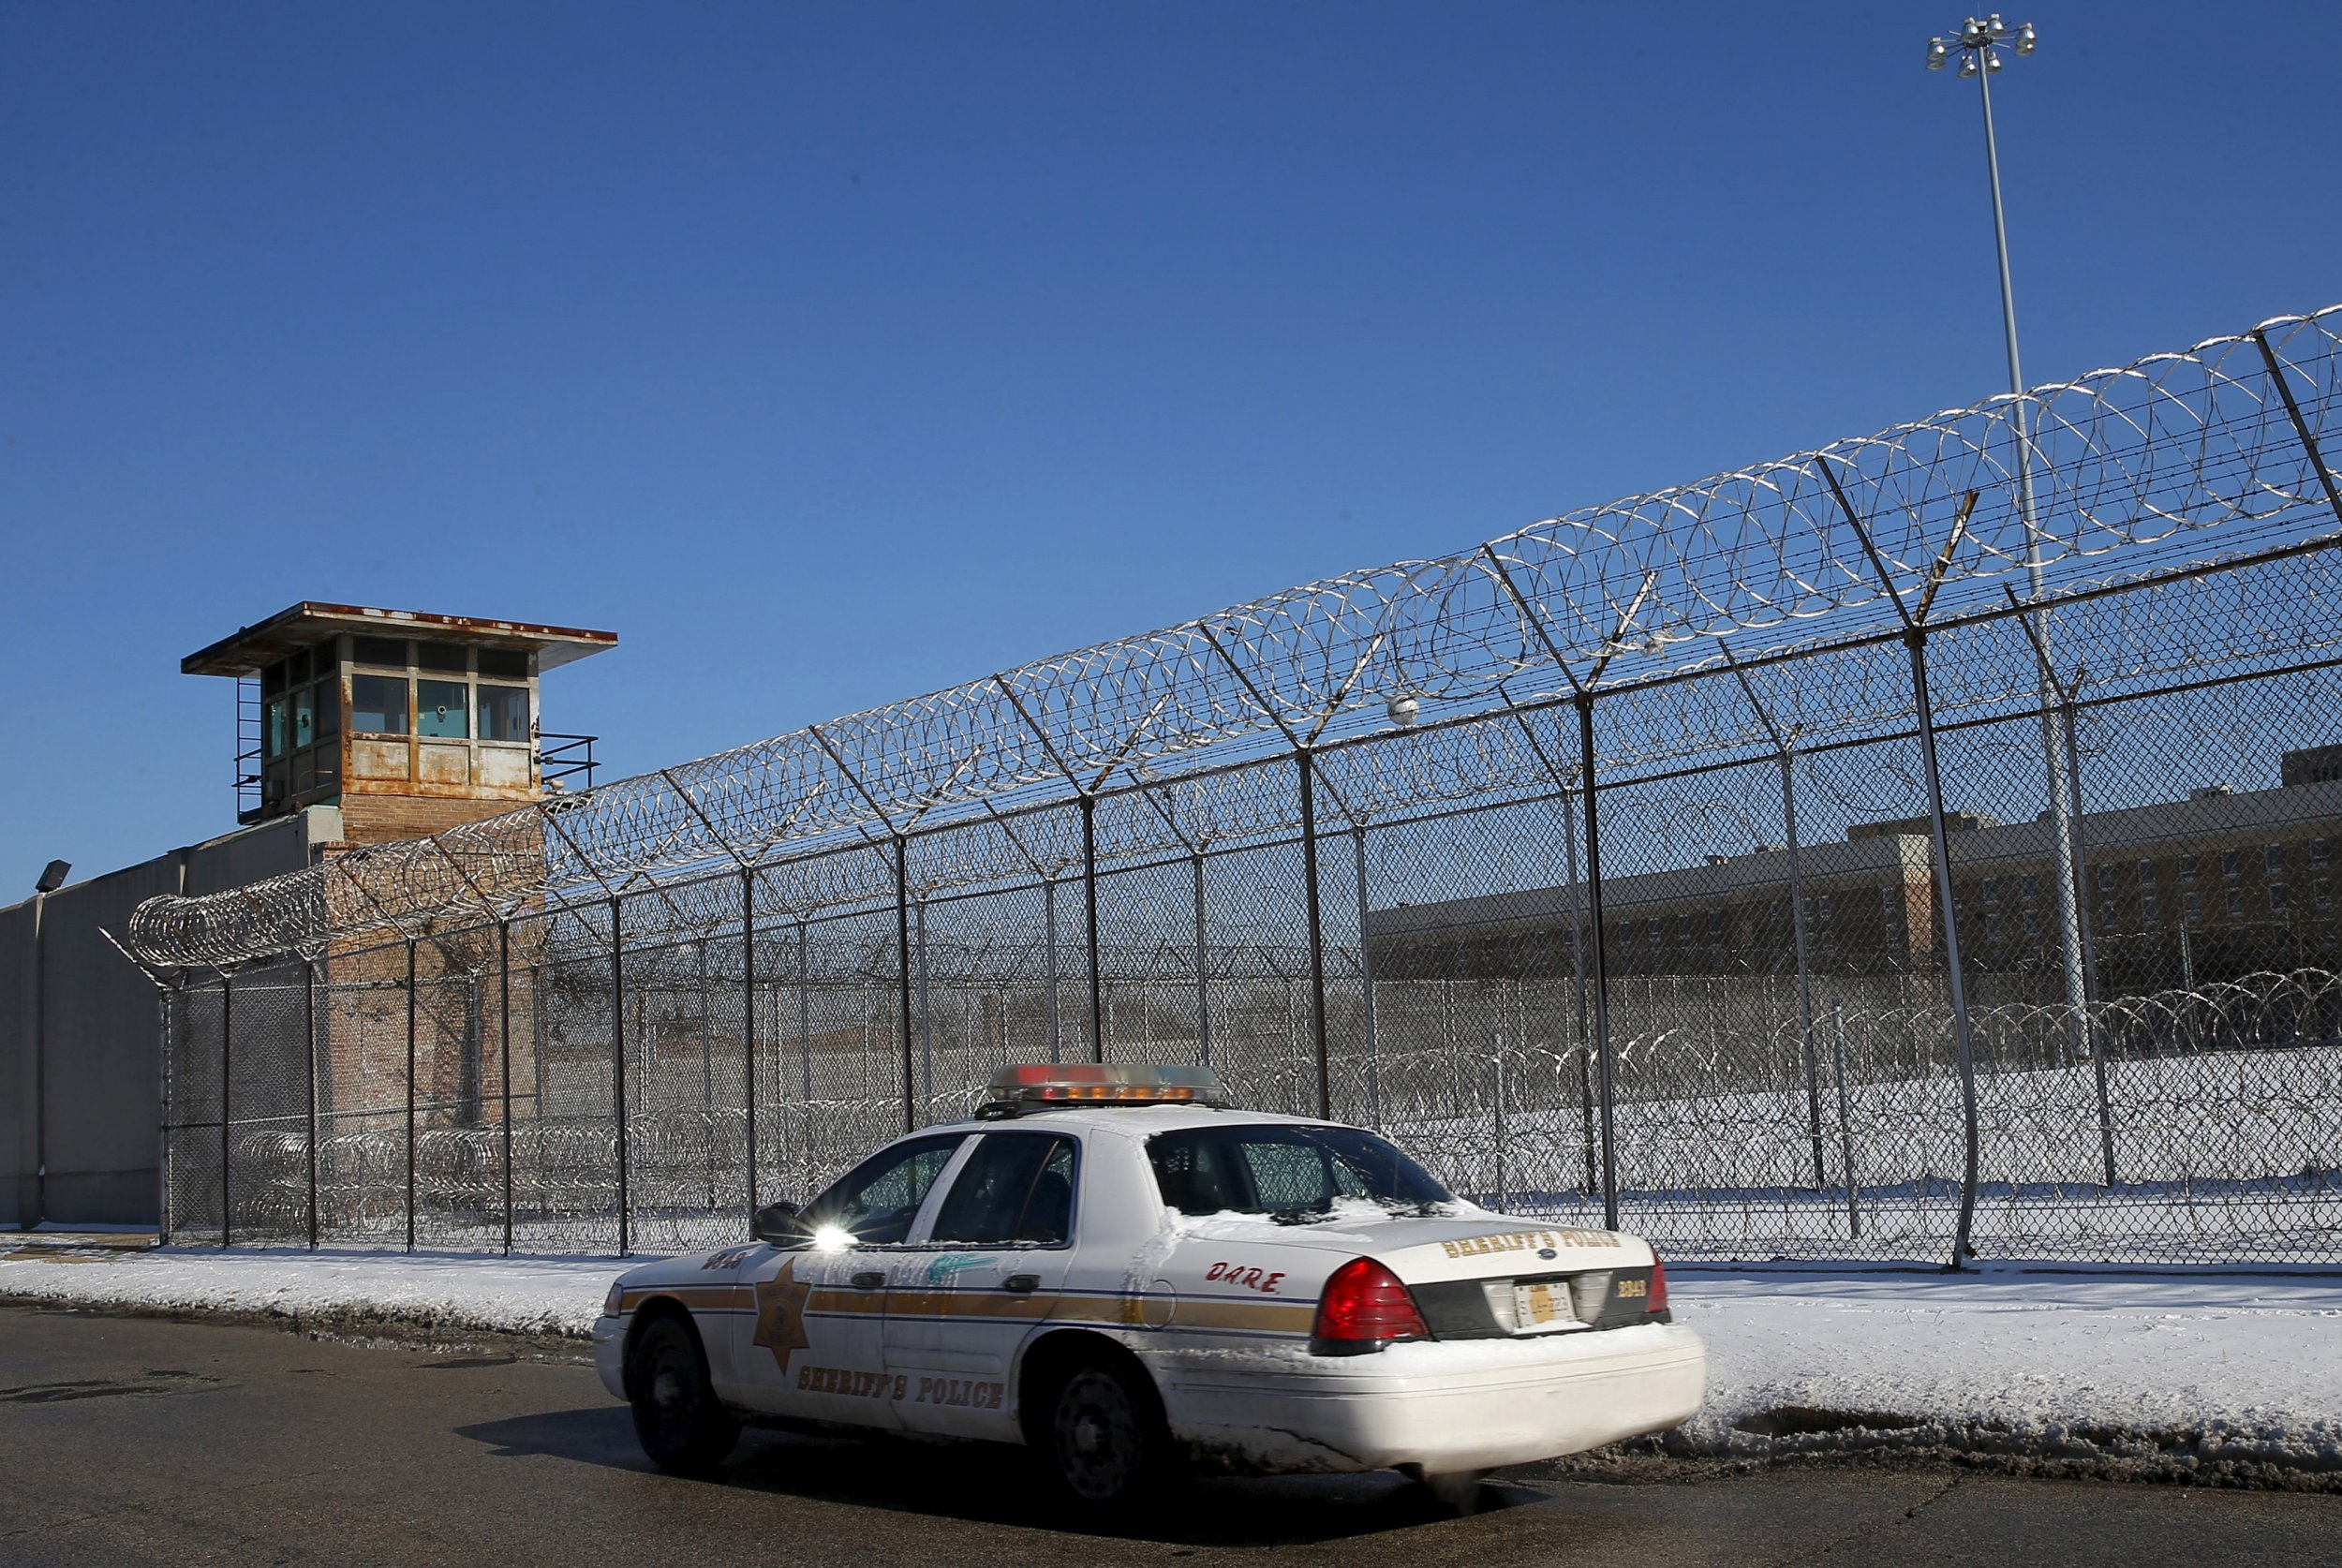 04_12_Clinton_Prison_01